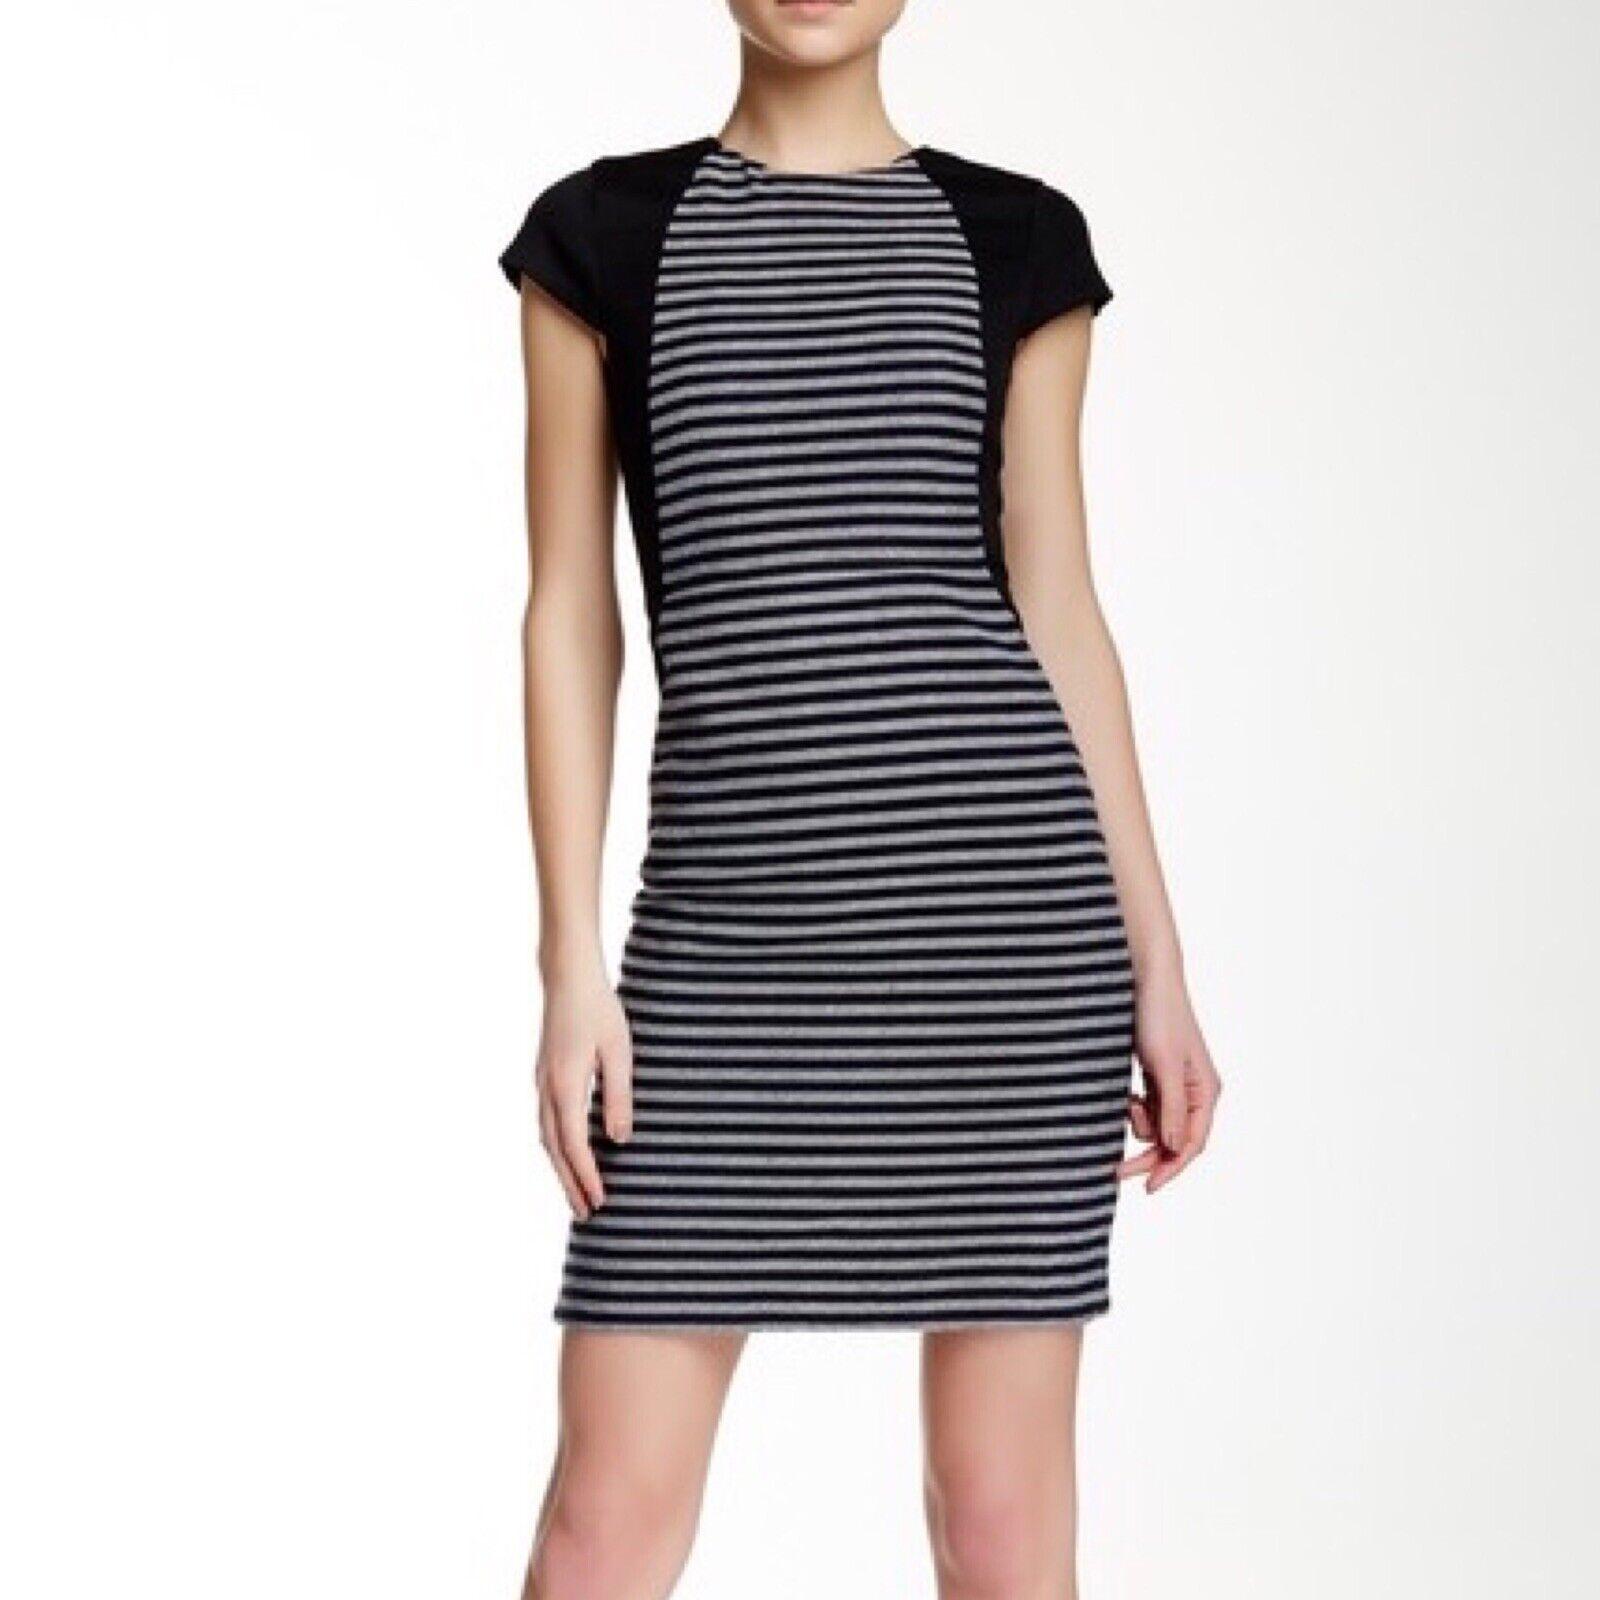 J. Crew Factory Suiting Tweed Striped Pencil Dress Navy Cream Wool Größe 4